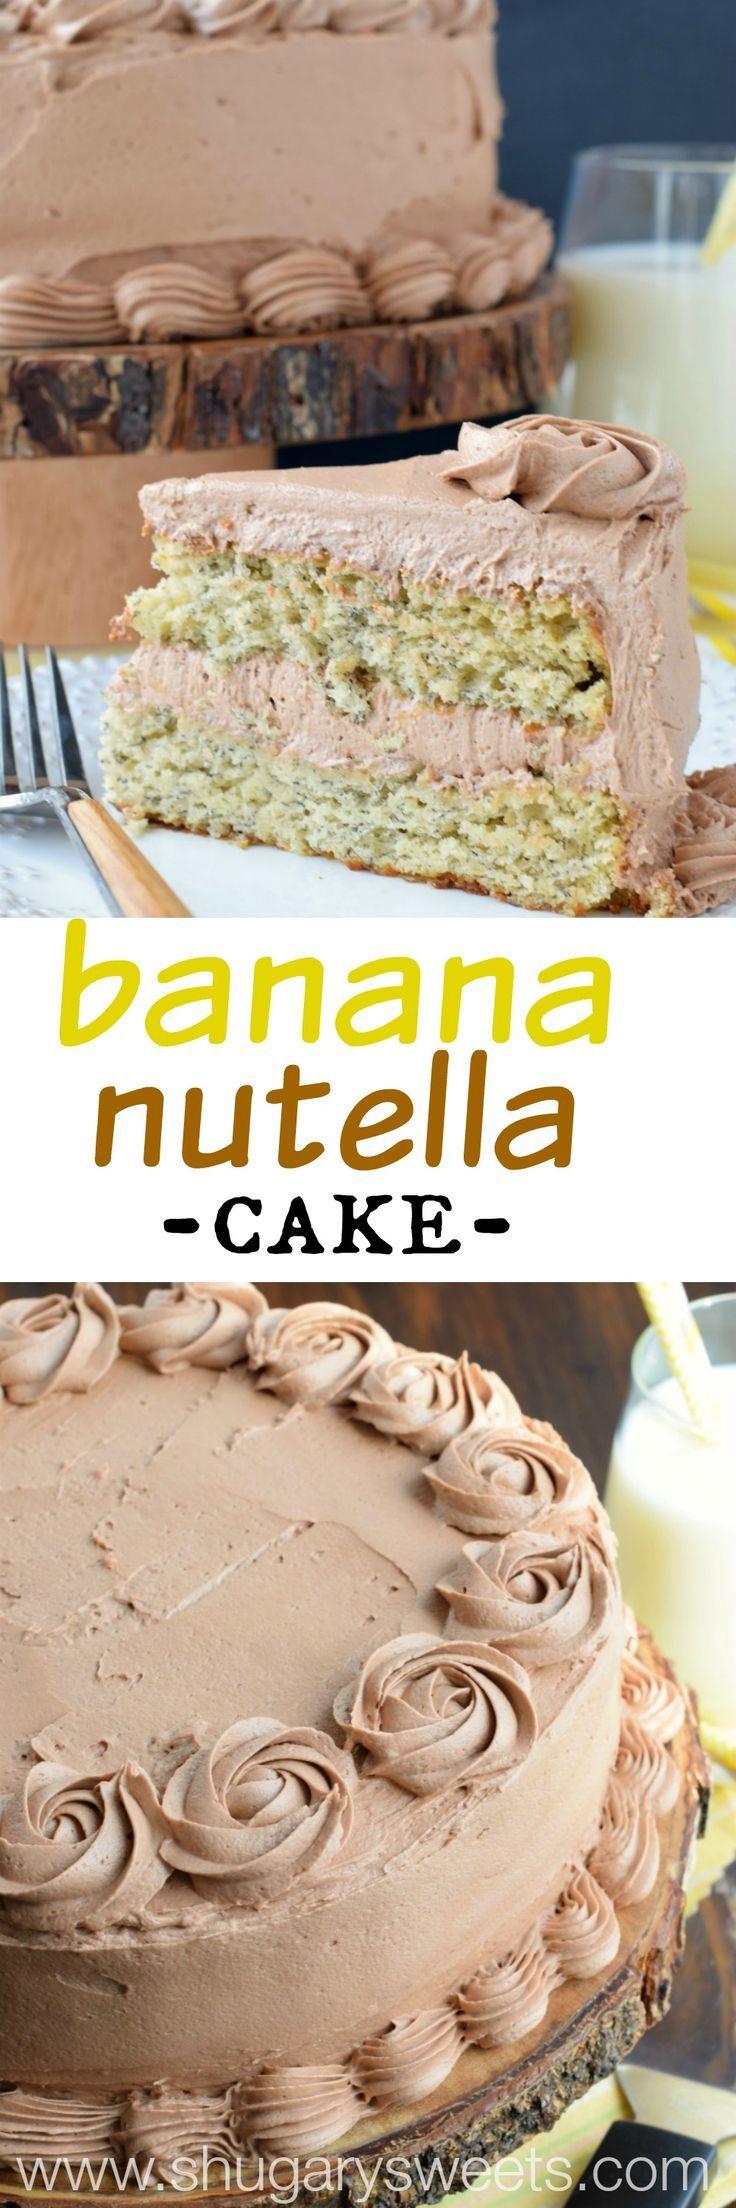 Nutella Buttercream Frosting For Cake